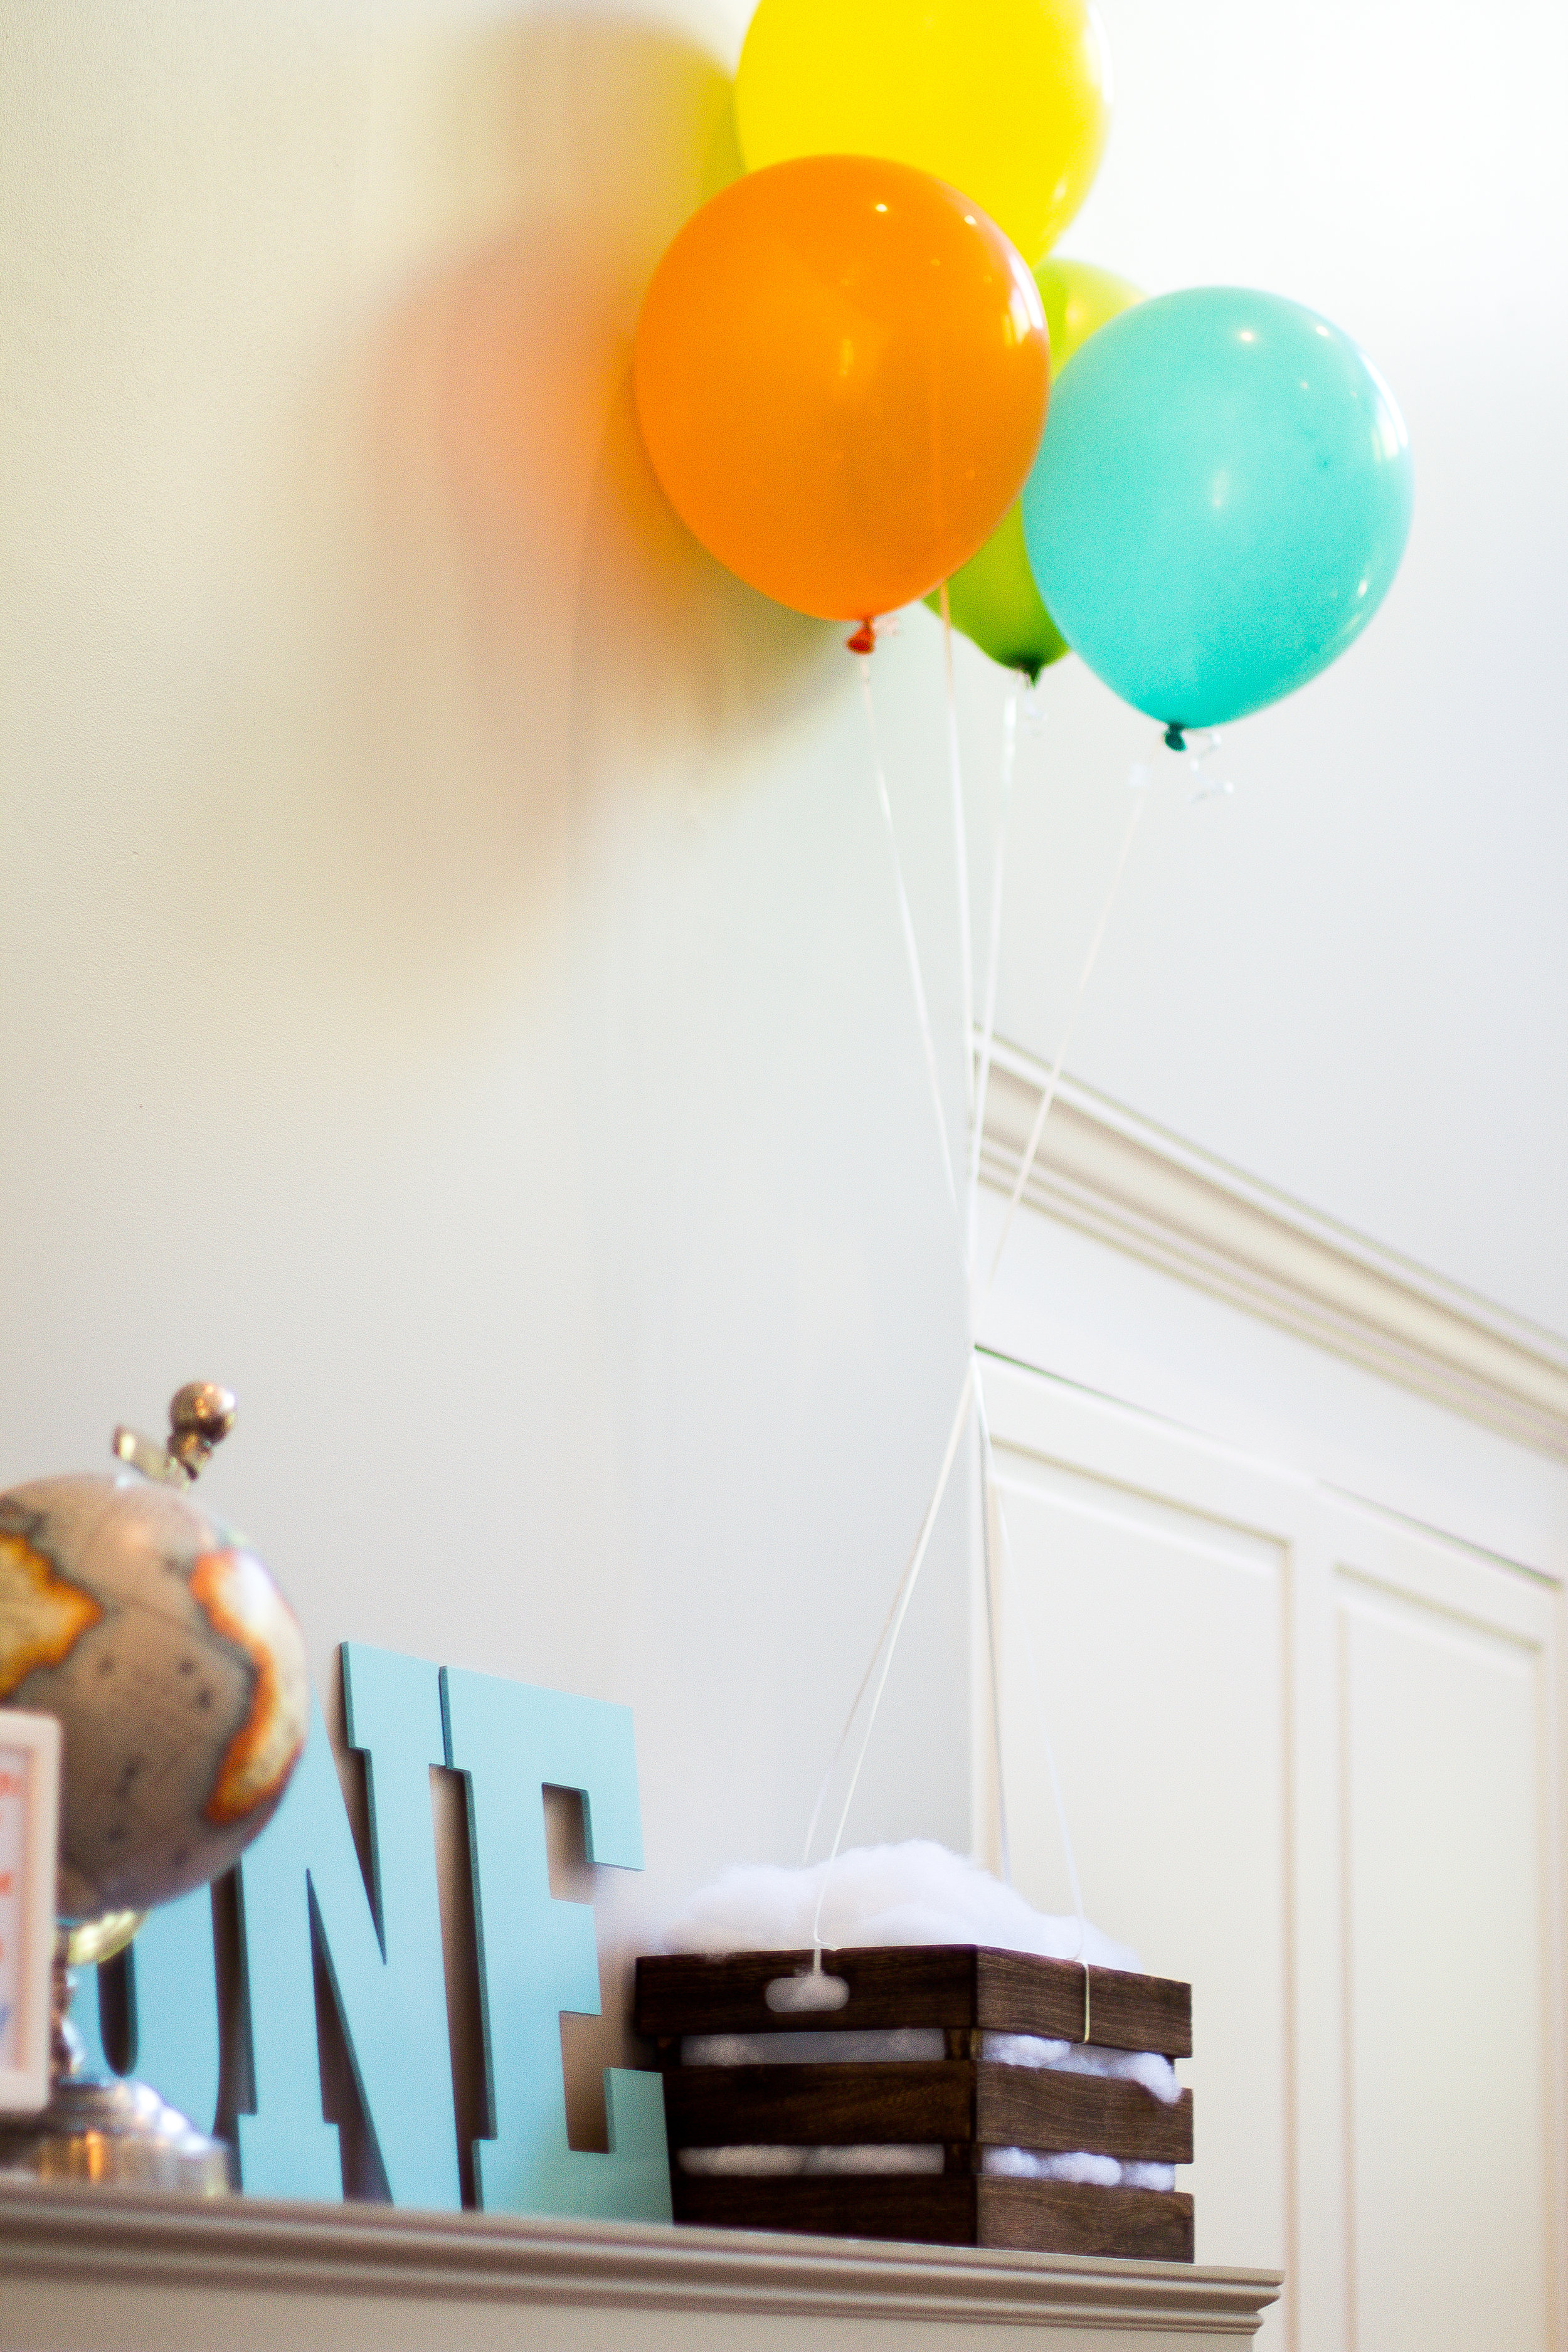 large-hot-air-balloon